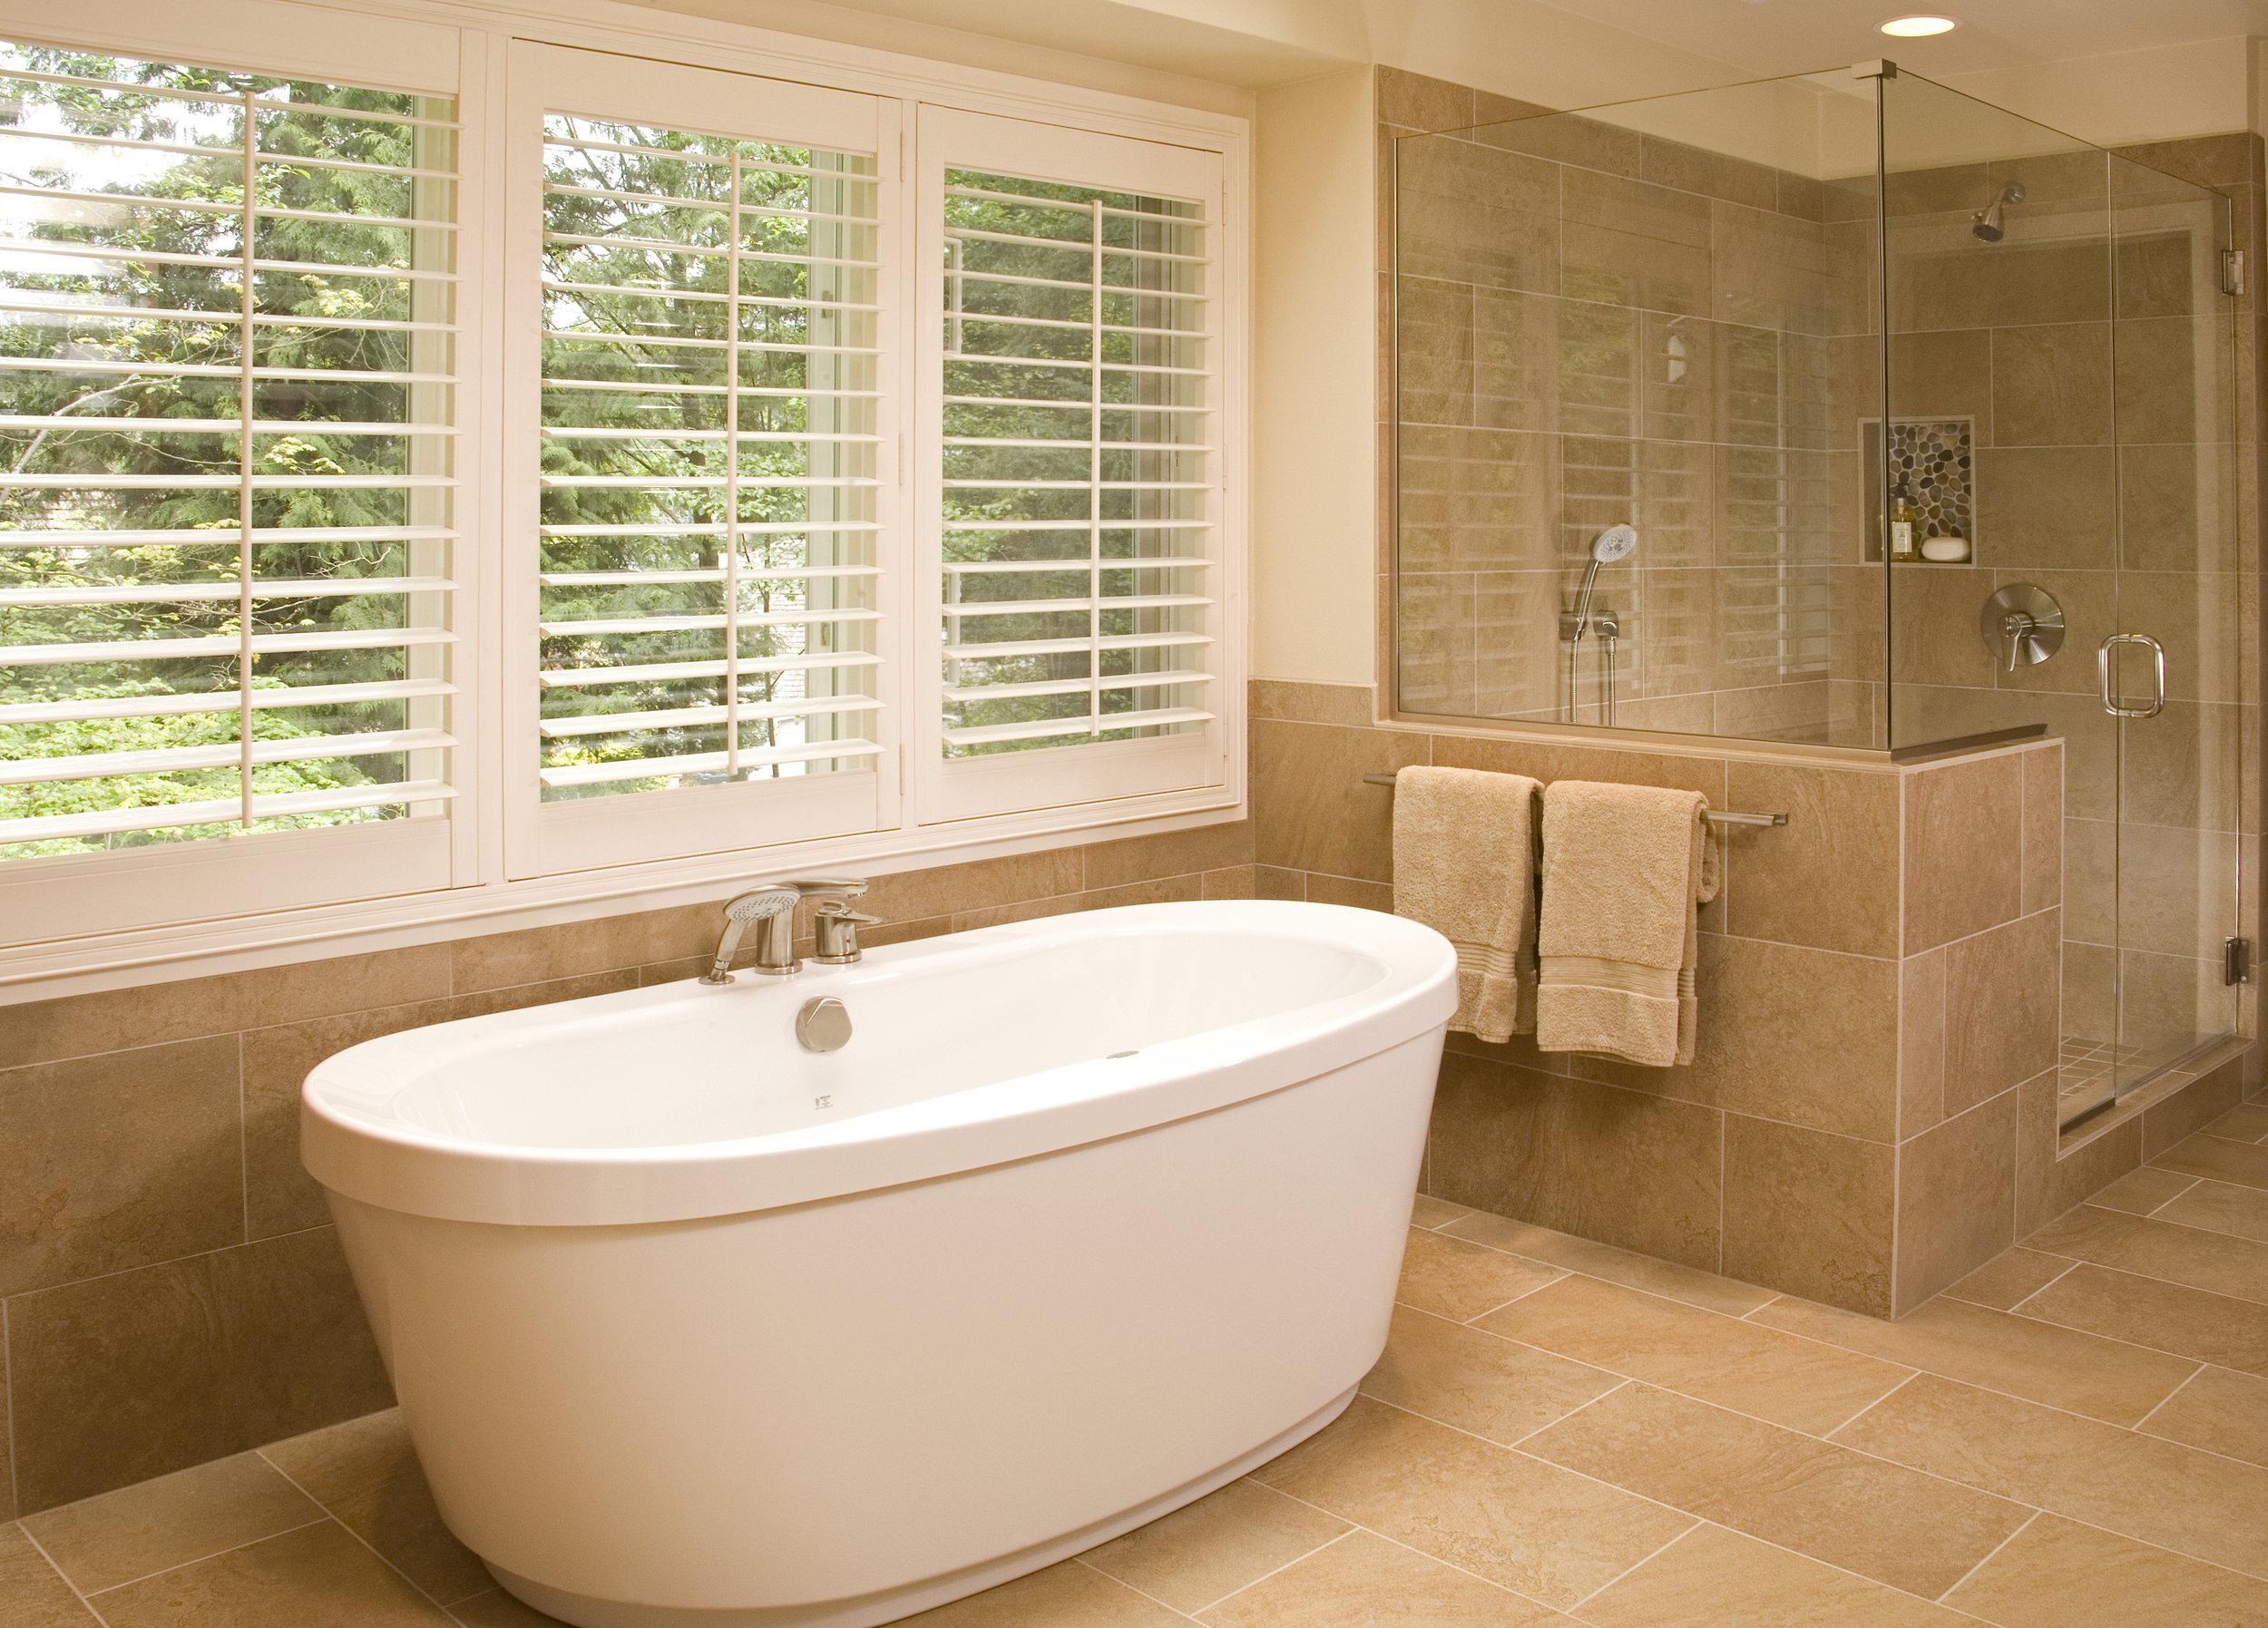 Shower Bath combo pic 001.jpg